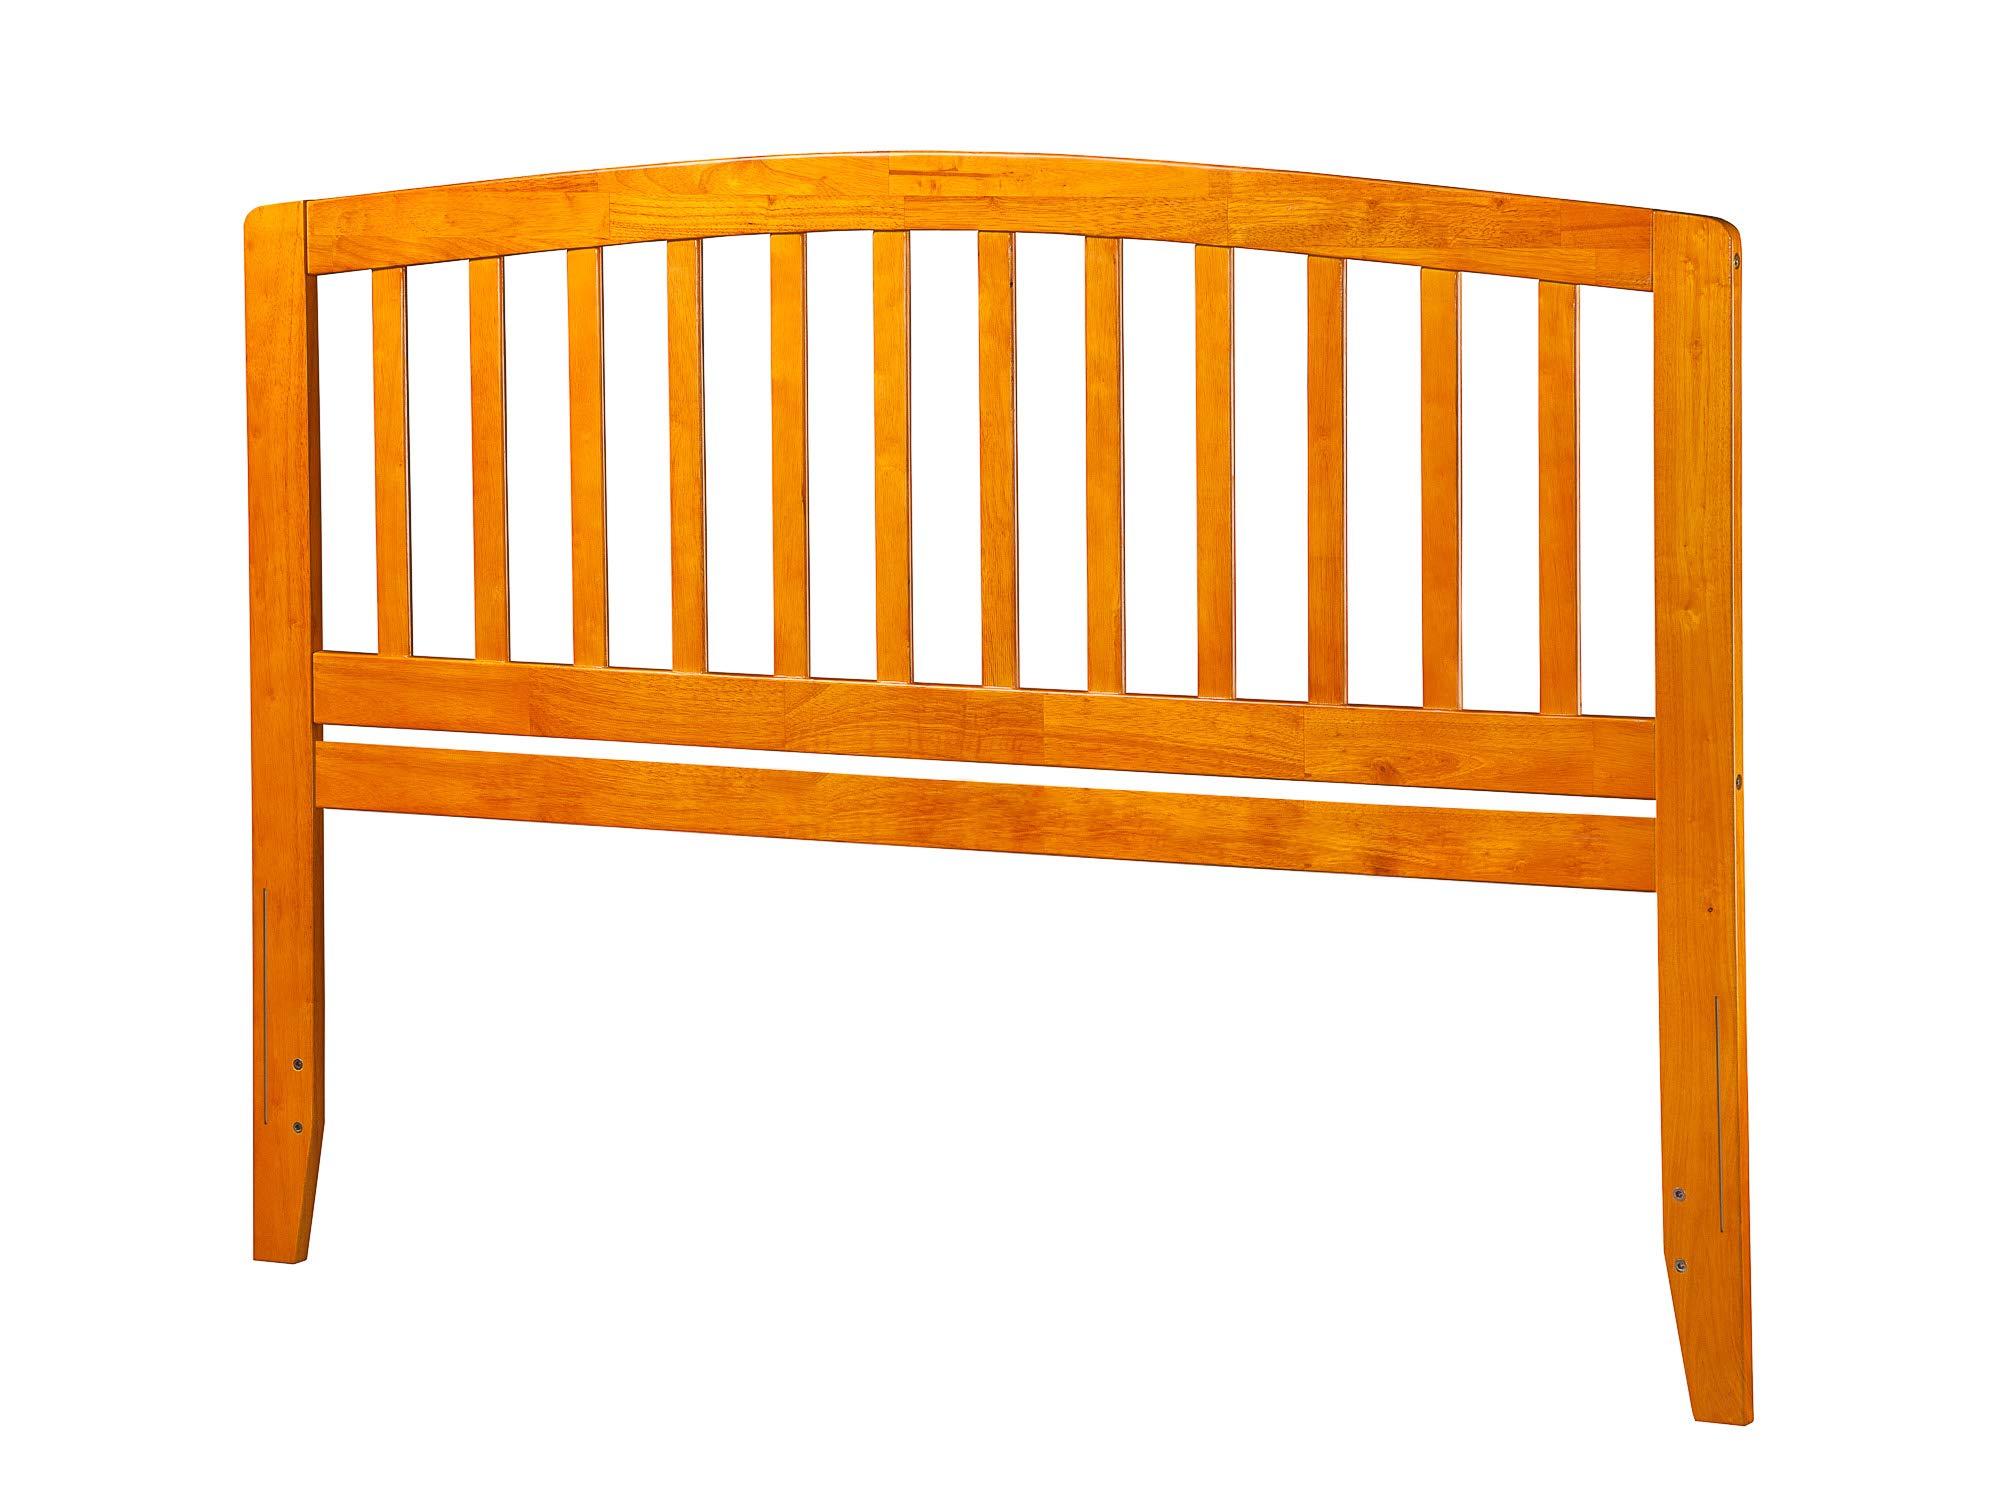 Atlantic Furniture AR288857 Richmond Headboard, King, Caramel by Atlantic Furniture